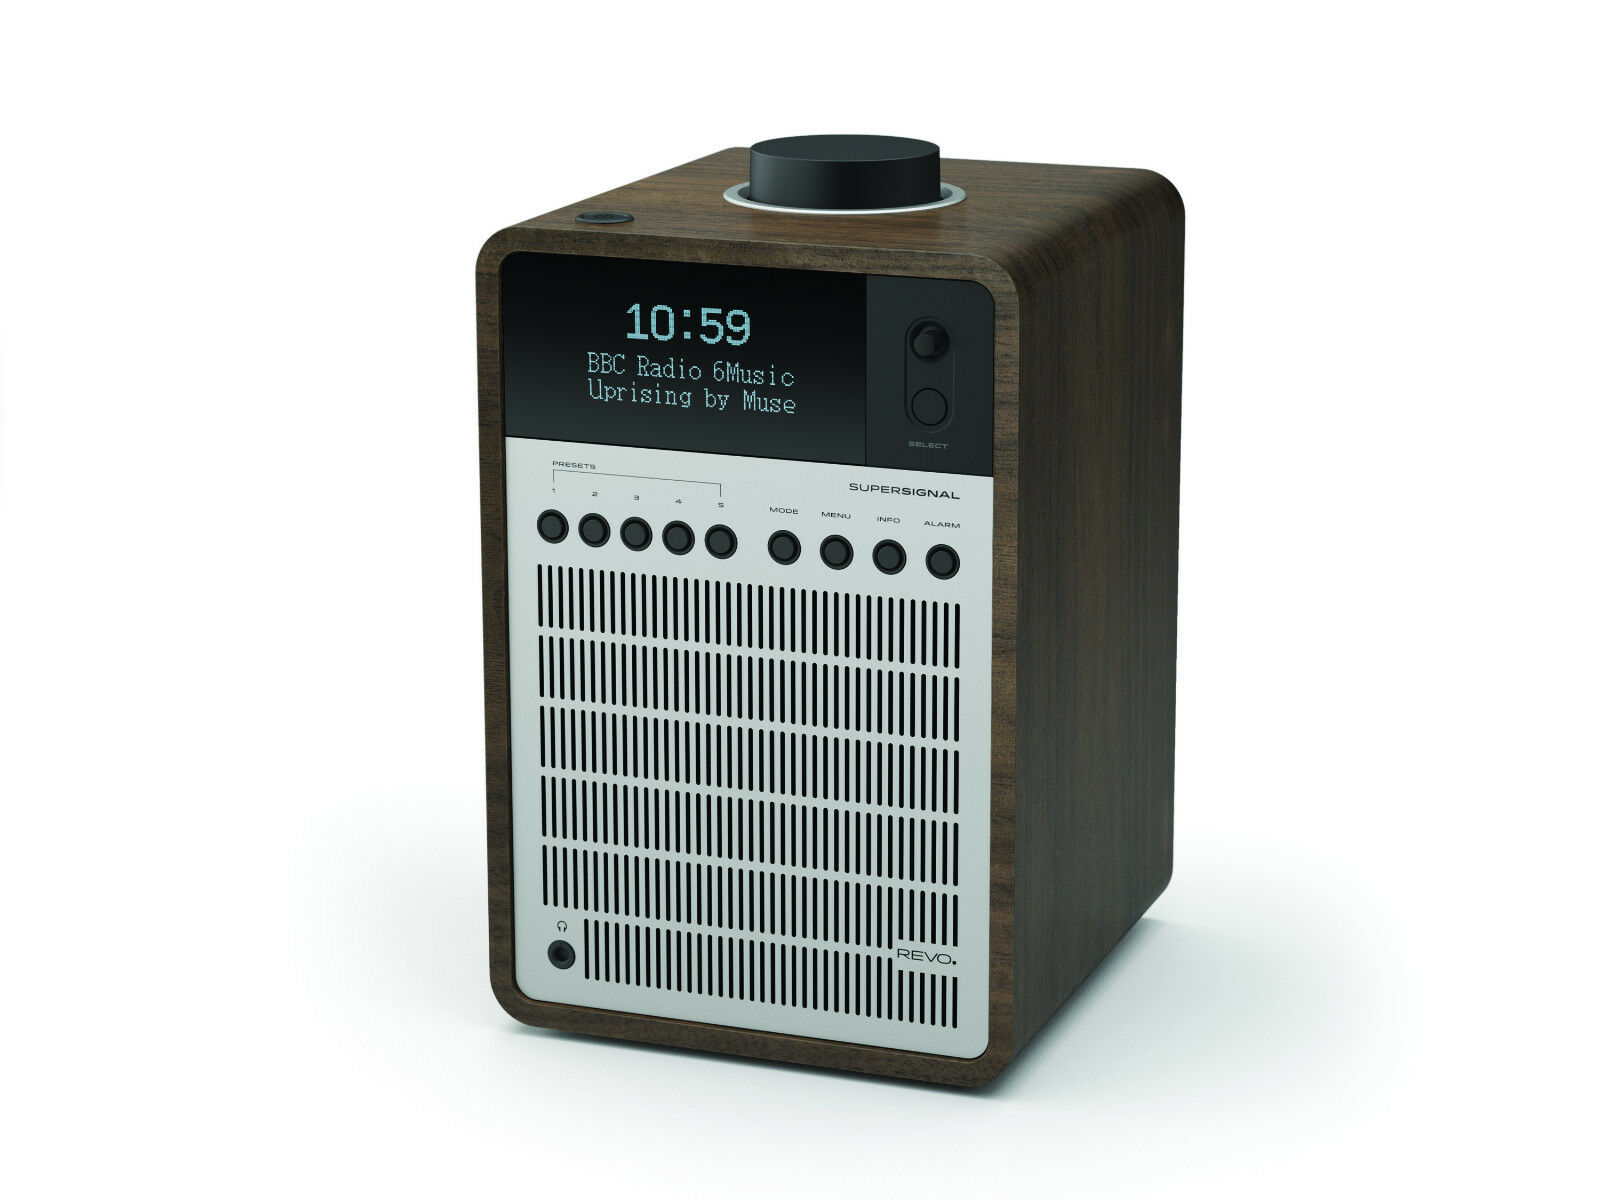 dab radio alarm clock ebay majority milton dab digital fm radio alarm clock black akai retro. Black Bedroom Furniture Sets. Home Design Ideas